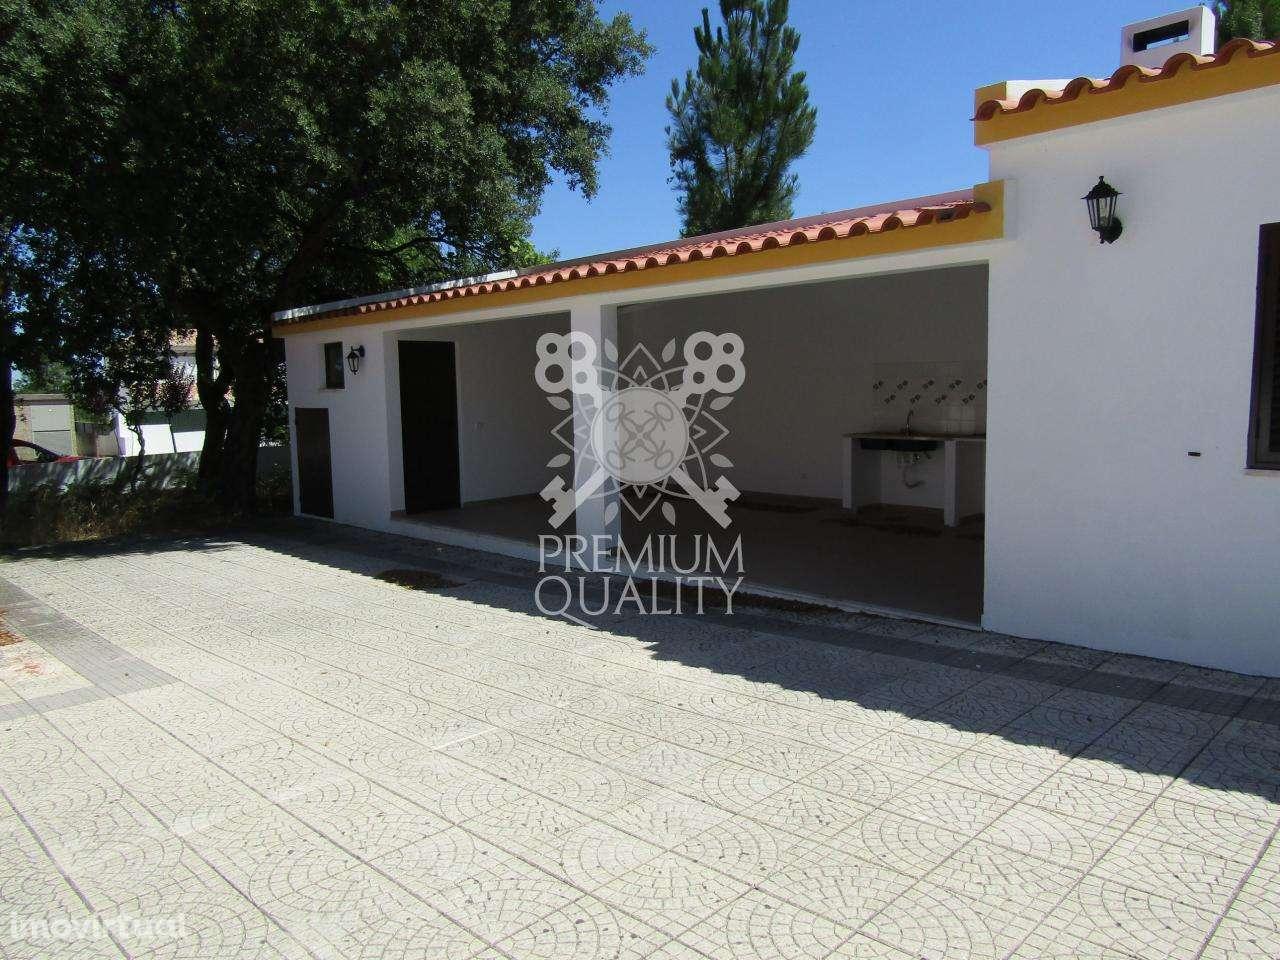 Moradia para comprar, Castelo (Sesimbra), Sesimbra, Setúbal - Foto 20